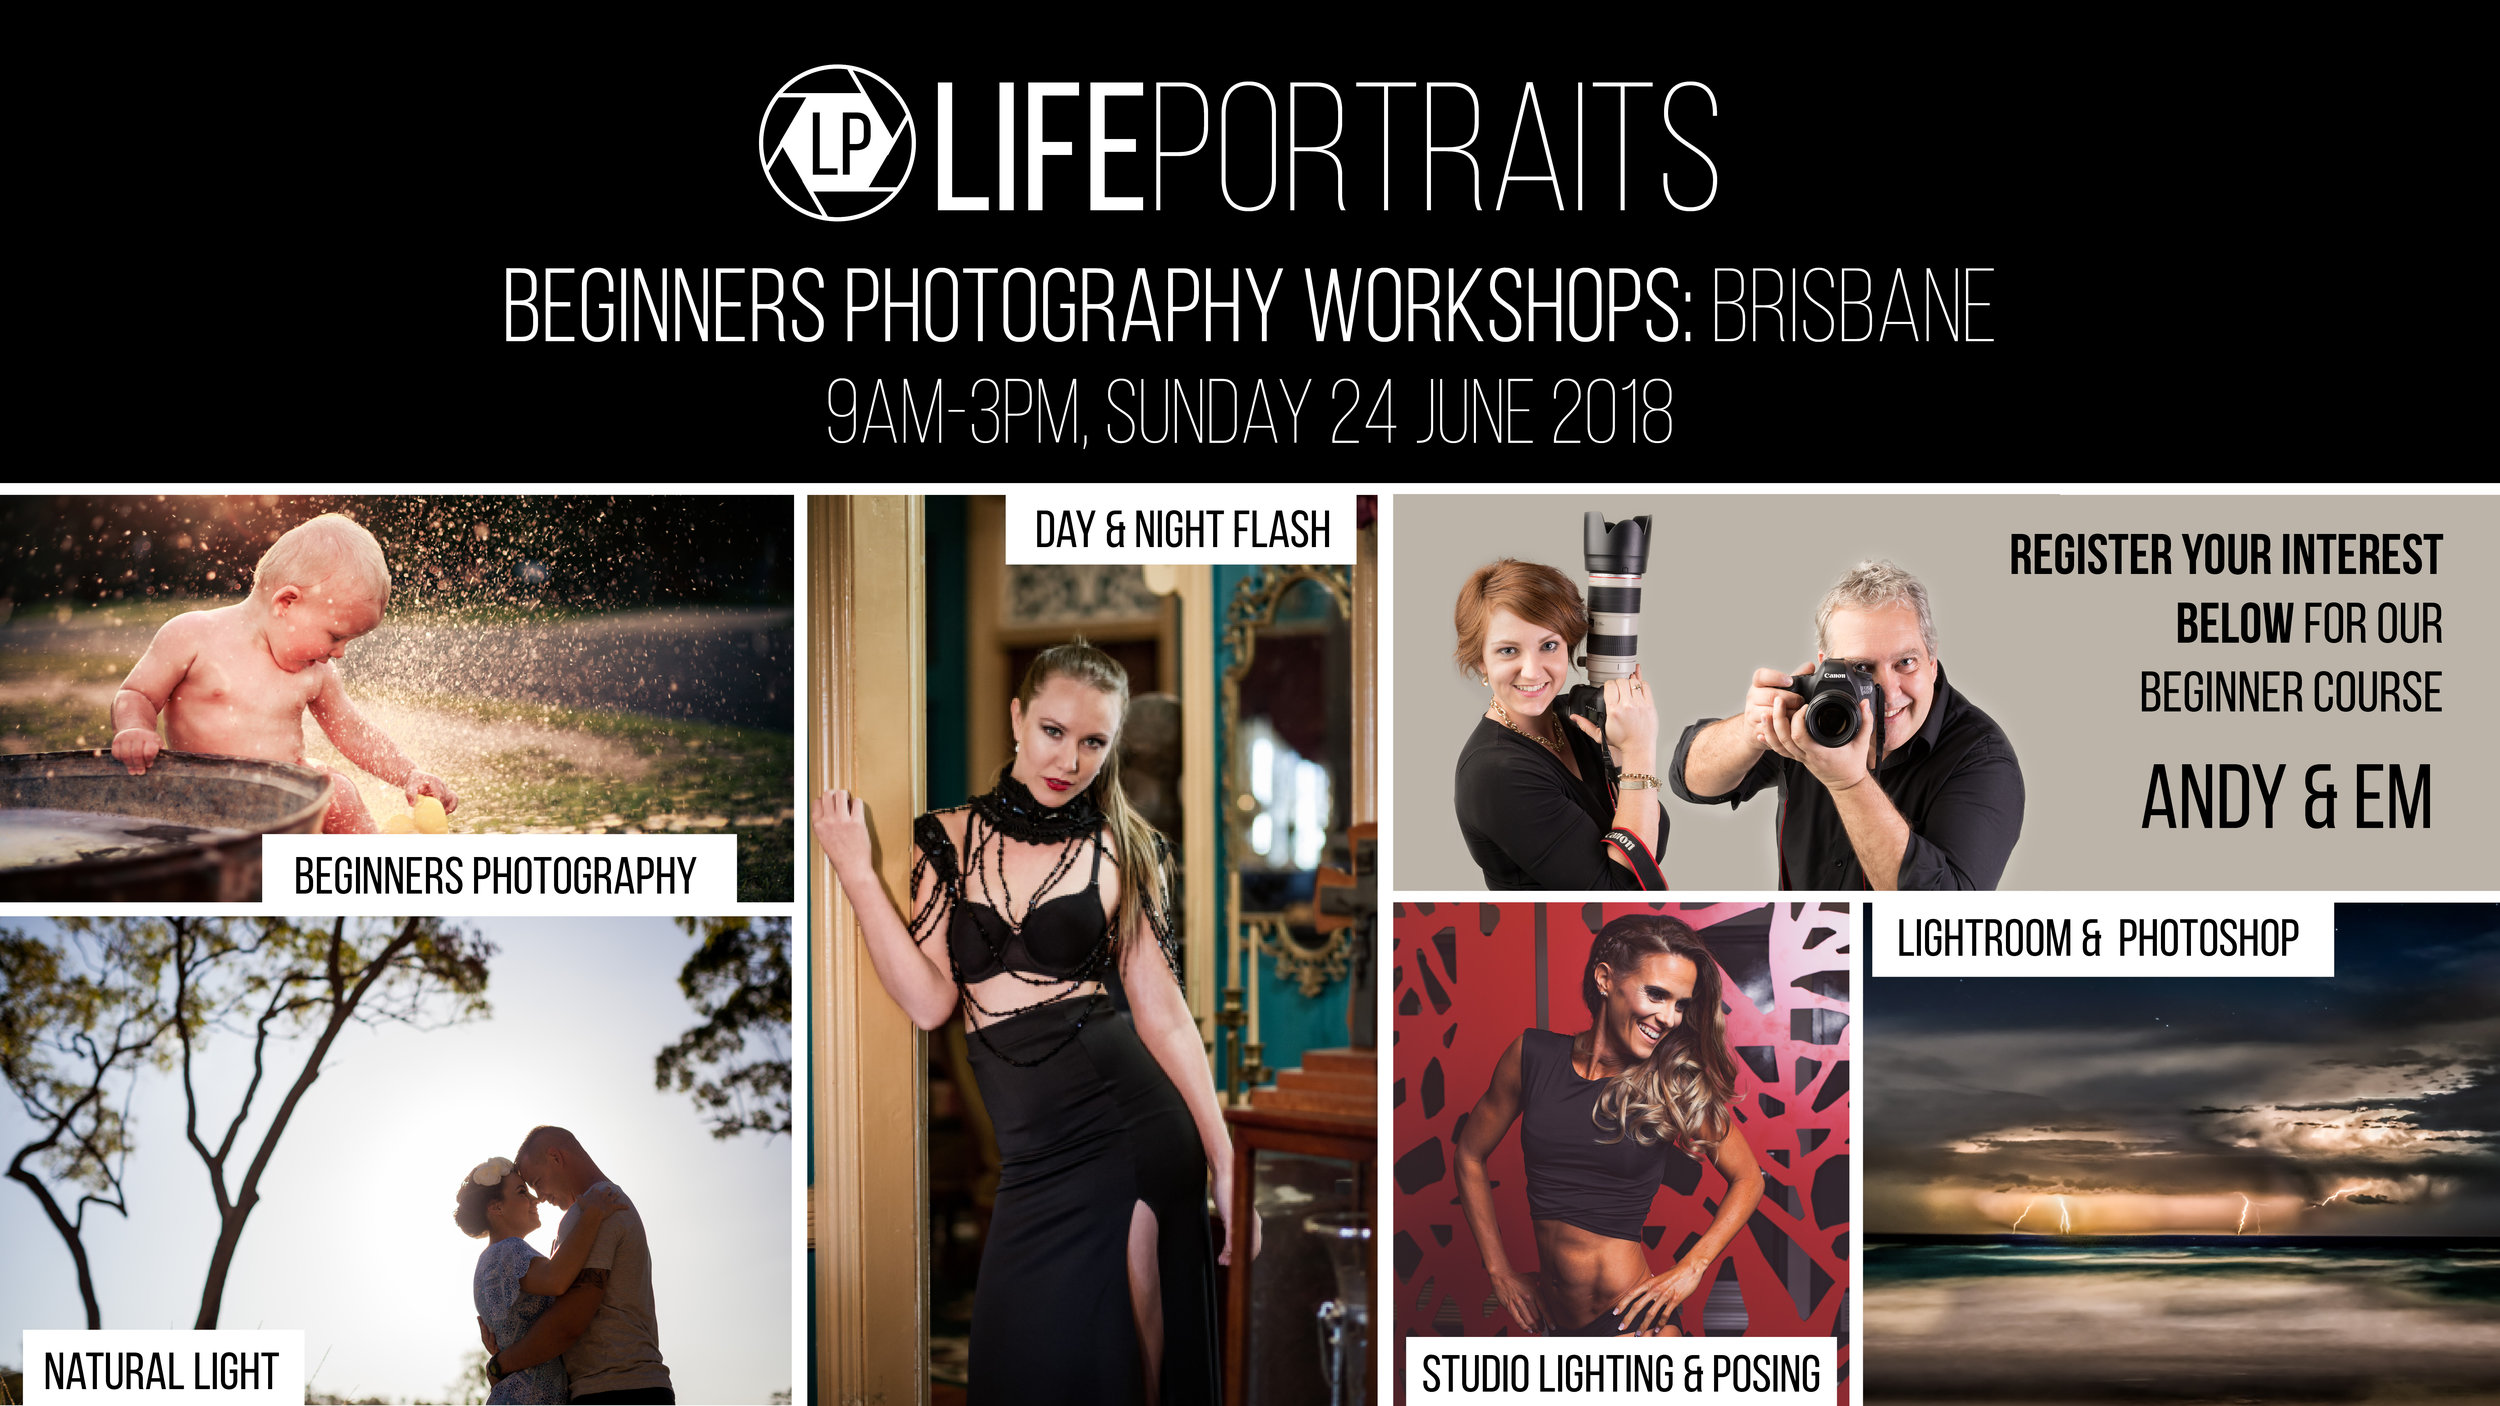 Brisbane Beginners Photography Workshop